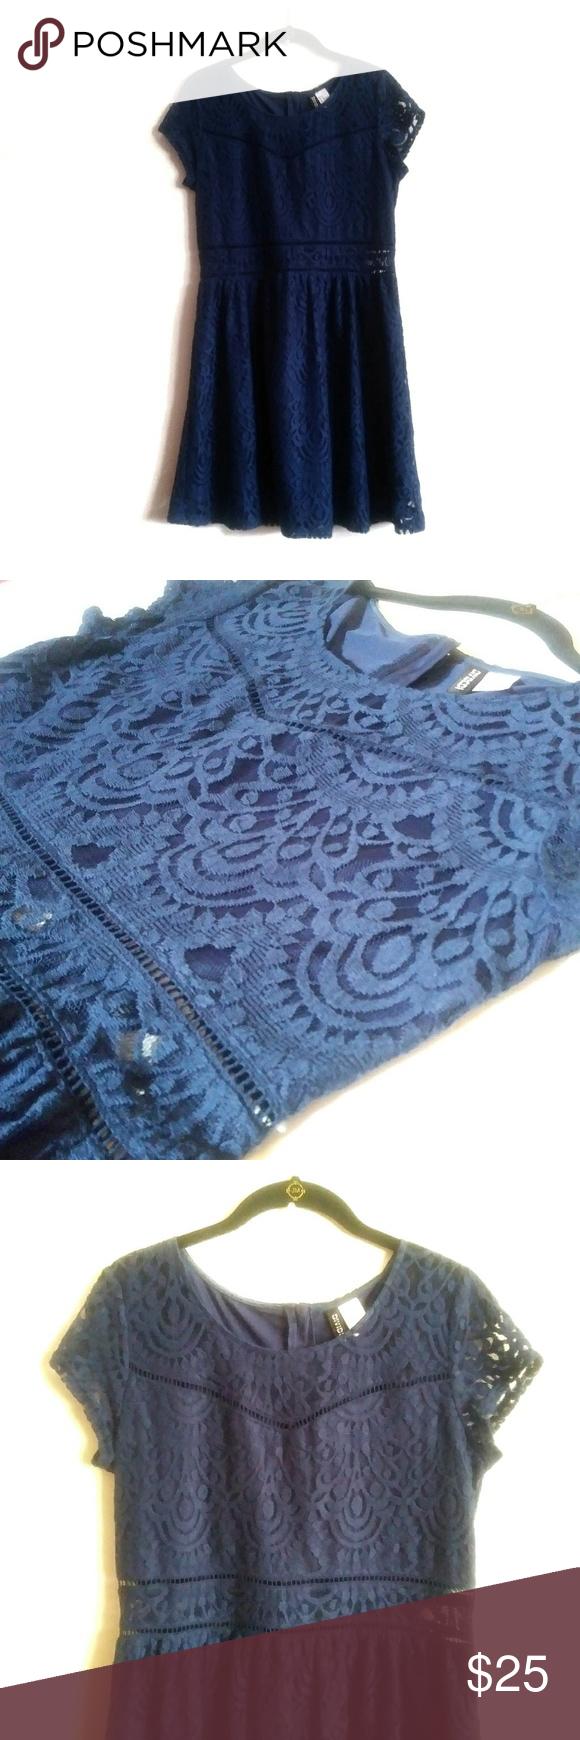 Divided HuM Lace Dress Blue Size  Divided HuM lace dress